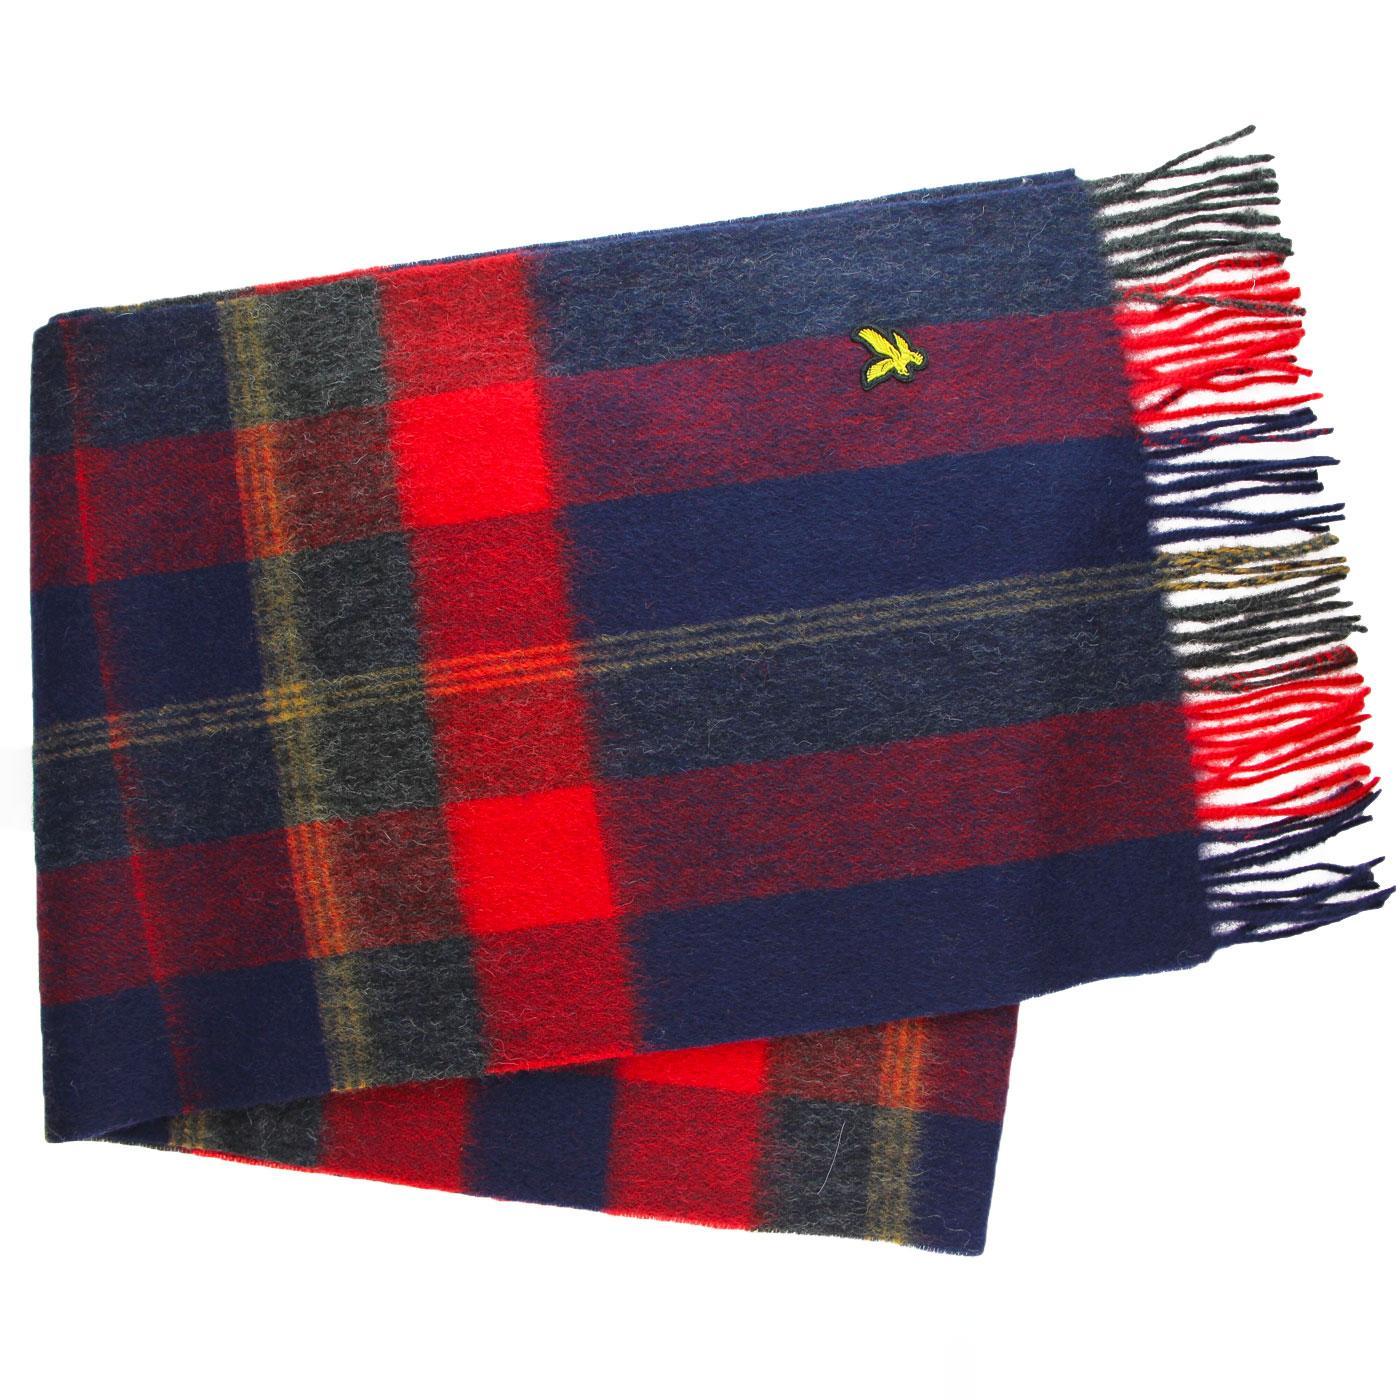 LYLE & SCOTT Retro Mod Tartan Wool Scarf (Navy)